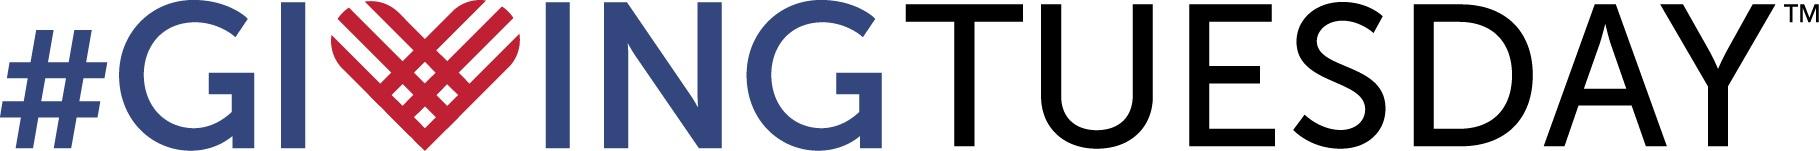 #GivingTuesday logo